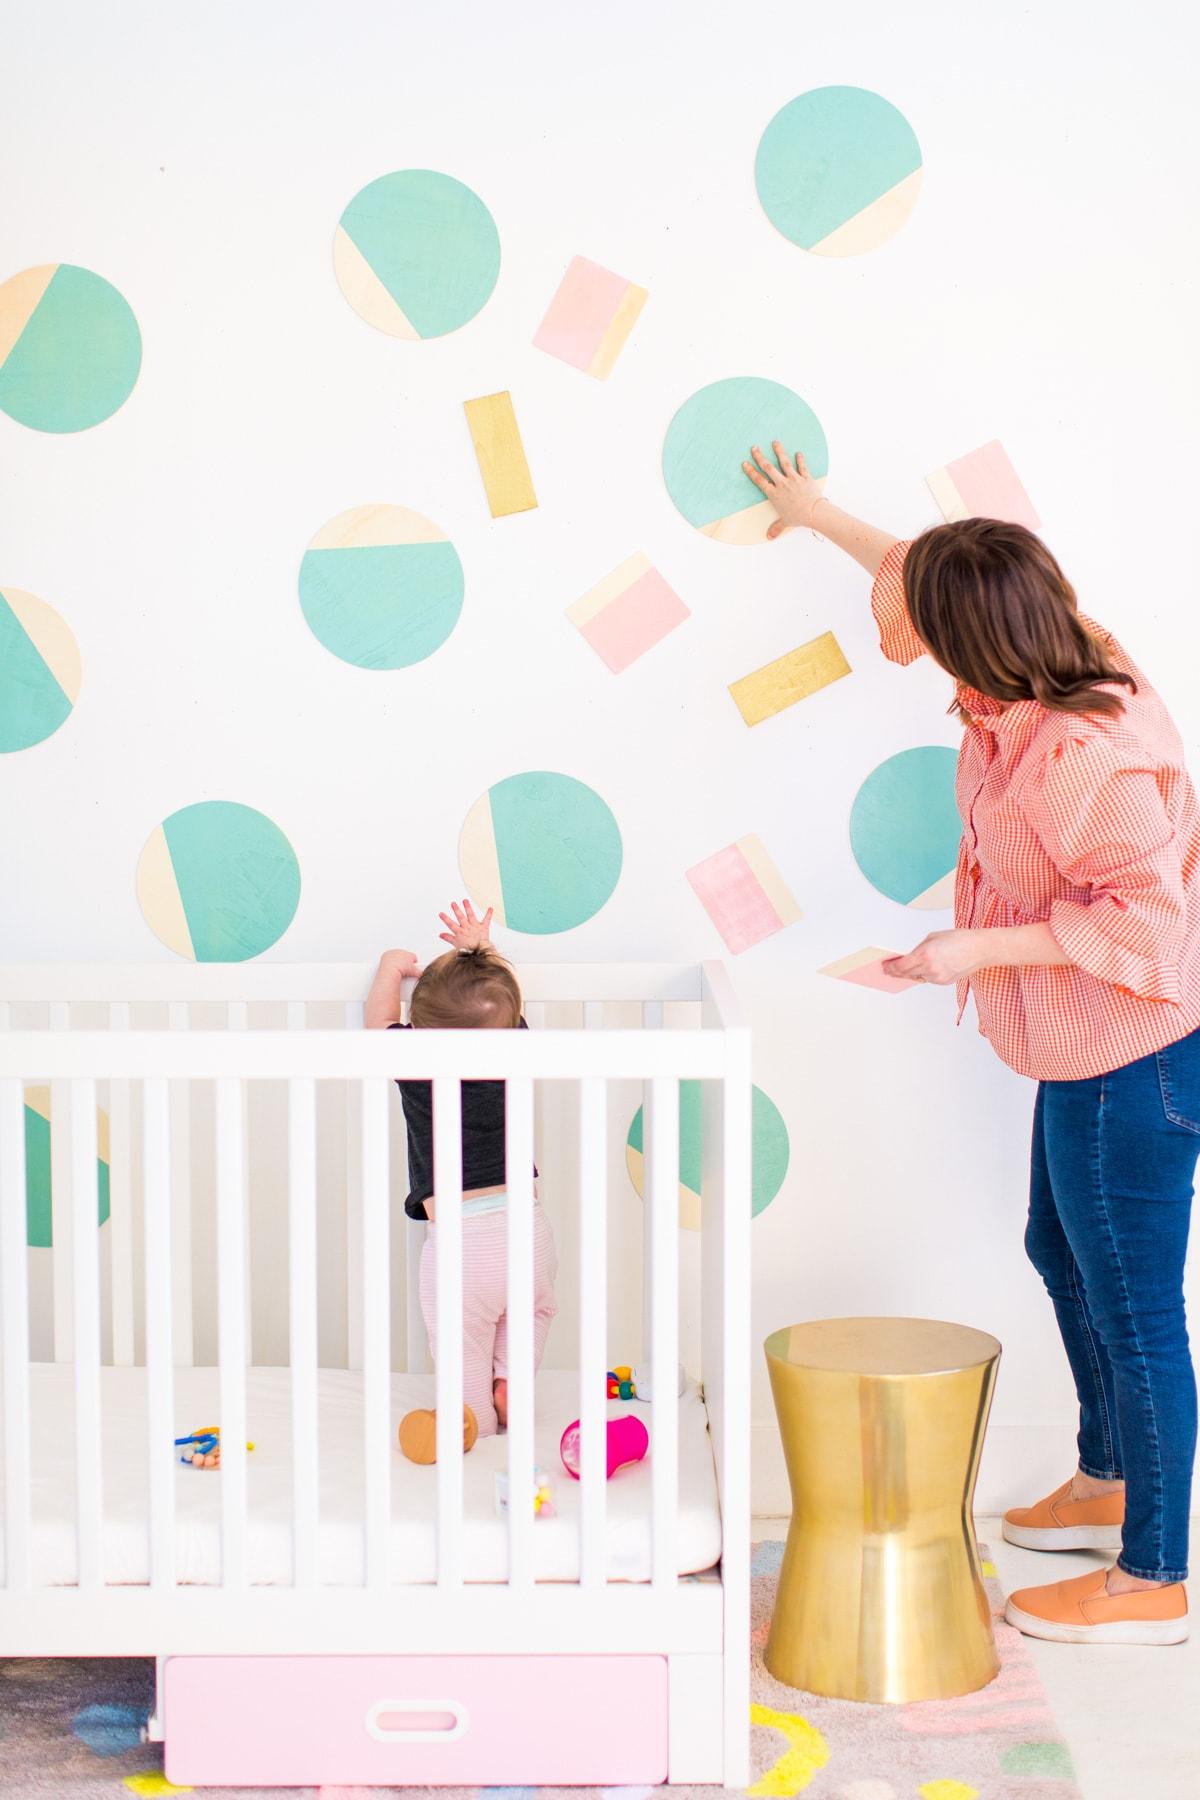 DIY Nursery Wall Decor by Houston lifestyle blogger Ashley Rose of Sugar and Cloth -- #DIYBABYROOMDECOR #KRYLON #SPRAYPAINTPROJECT #NURSERYIDEAS